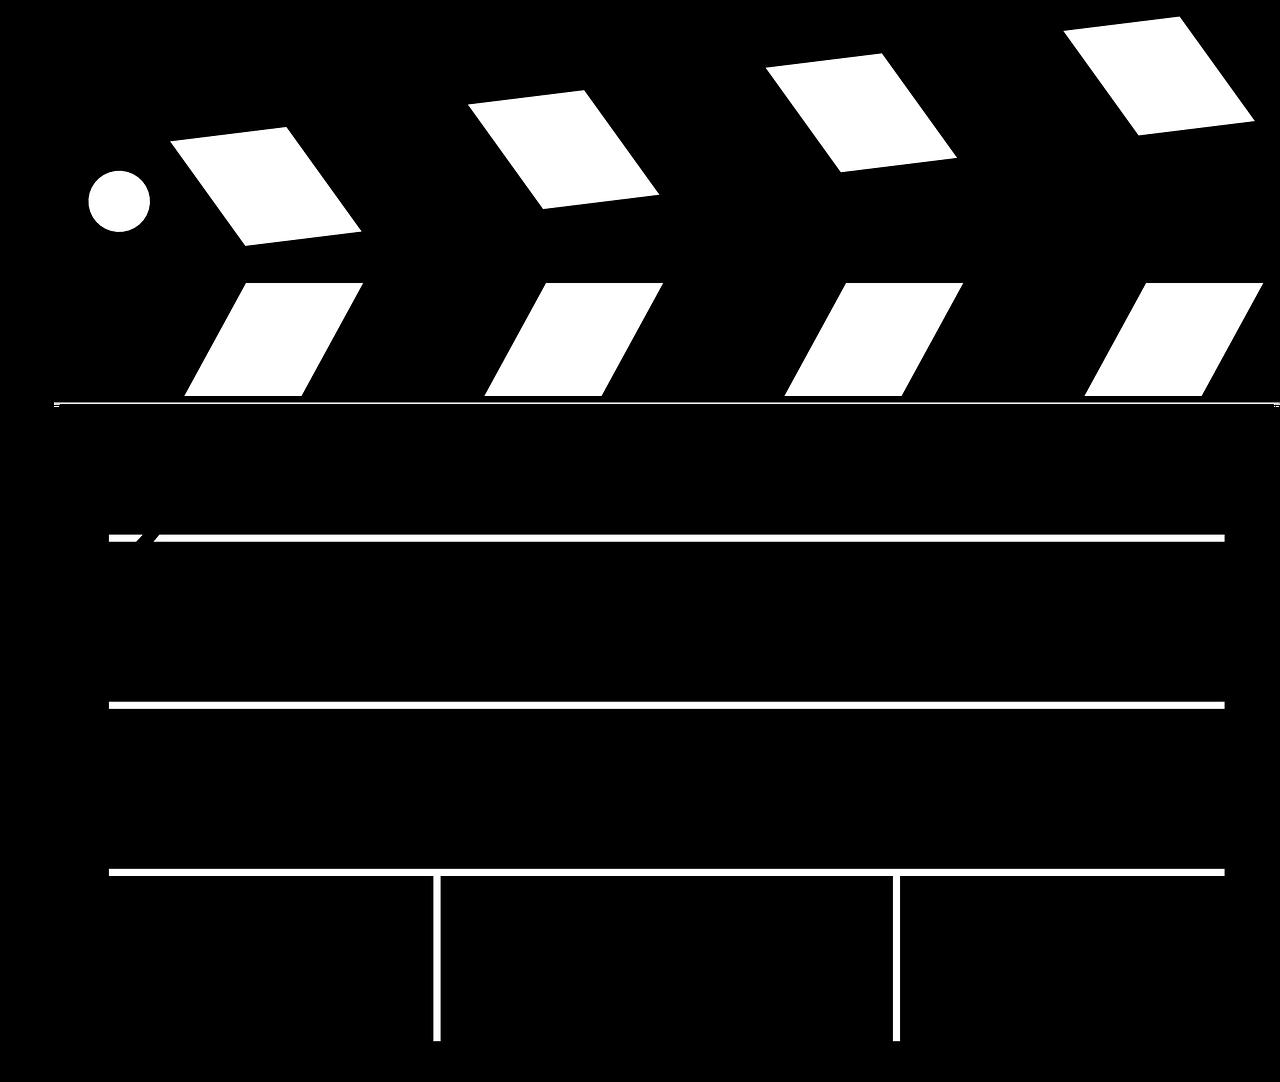 Clipboard clap blank were. Film clipart movie star